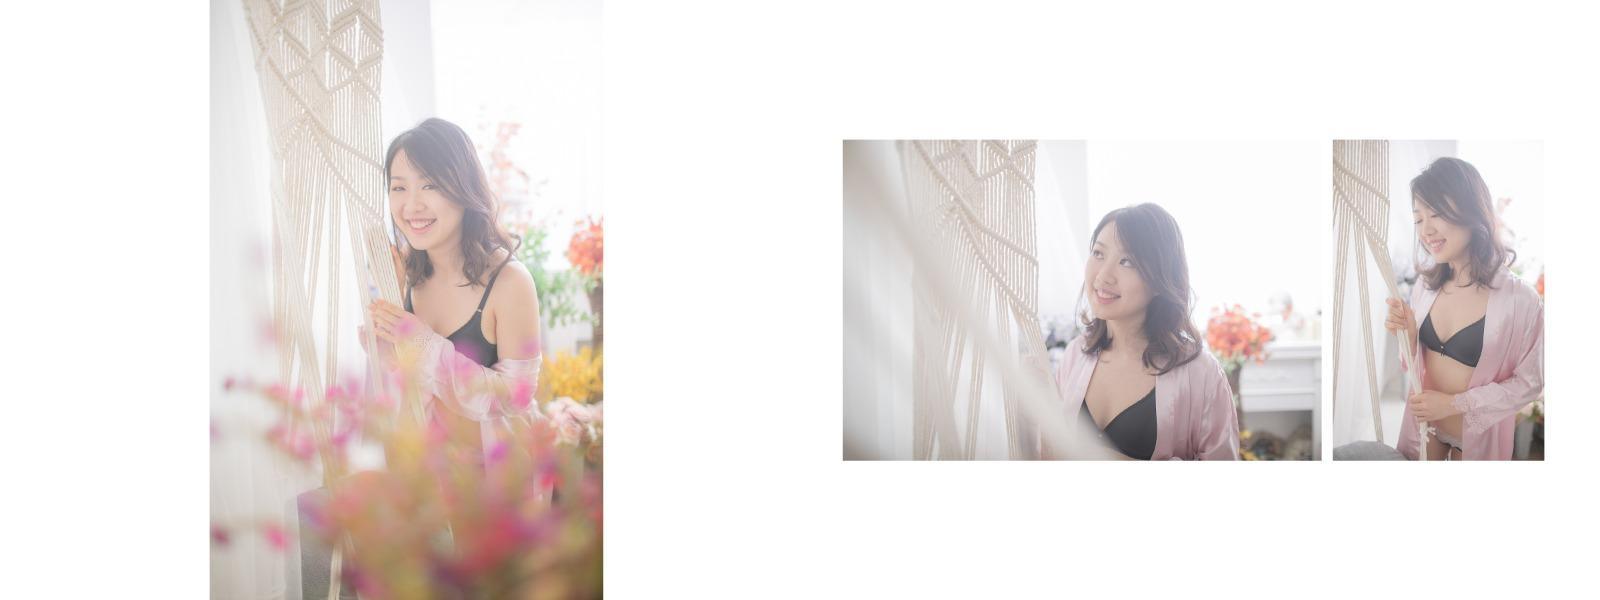 香港個人閨蜜寫真服務推薦 paulstylist best Boudoir Portrait photography Recommend hk 17